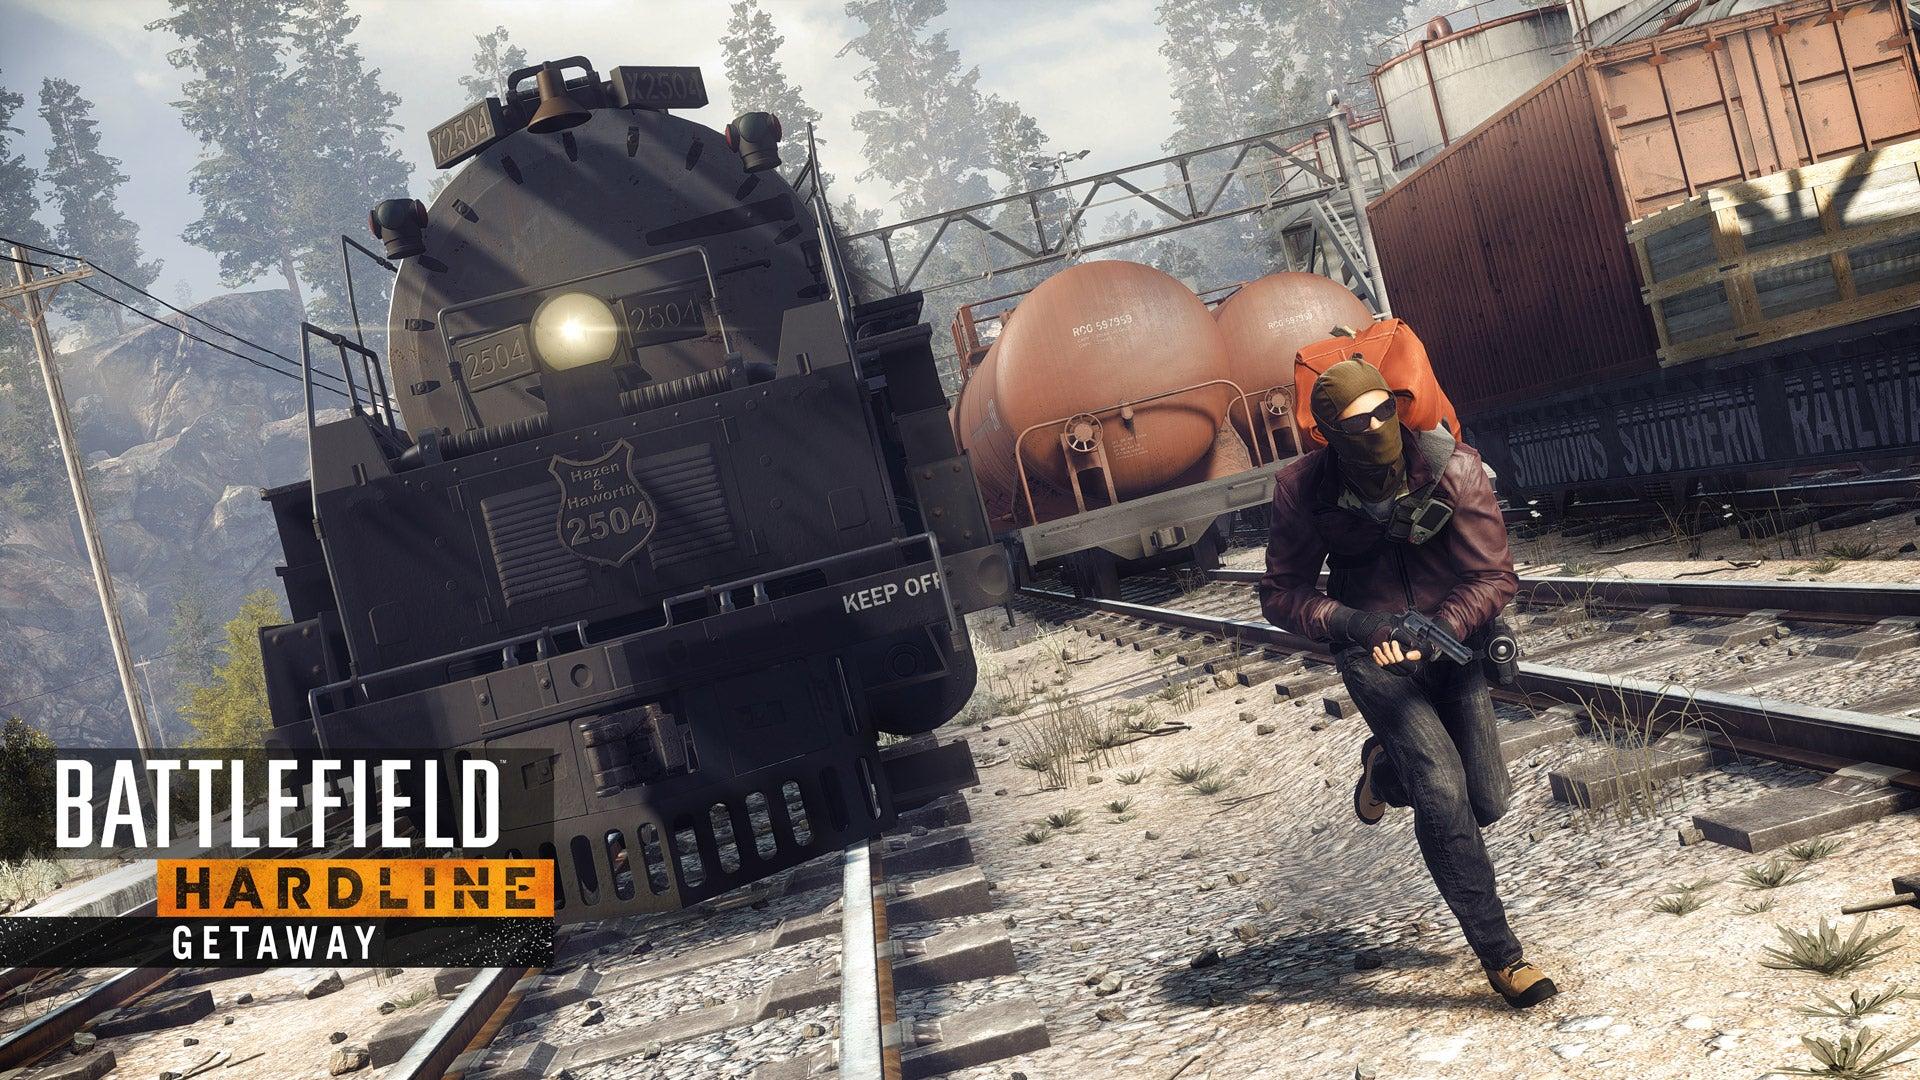 Image for Battlefield Hardline: Getaway cinematic trailer shows what Premium folks get January 12